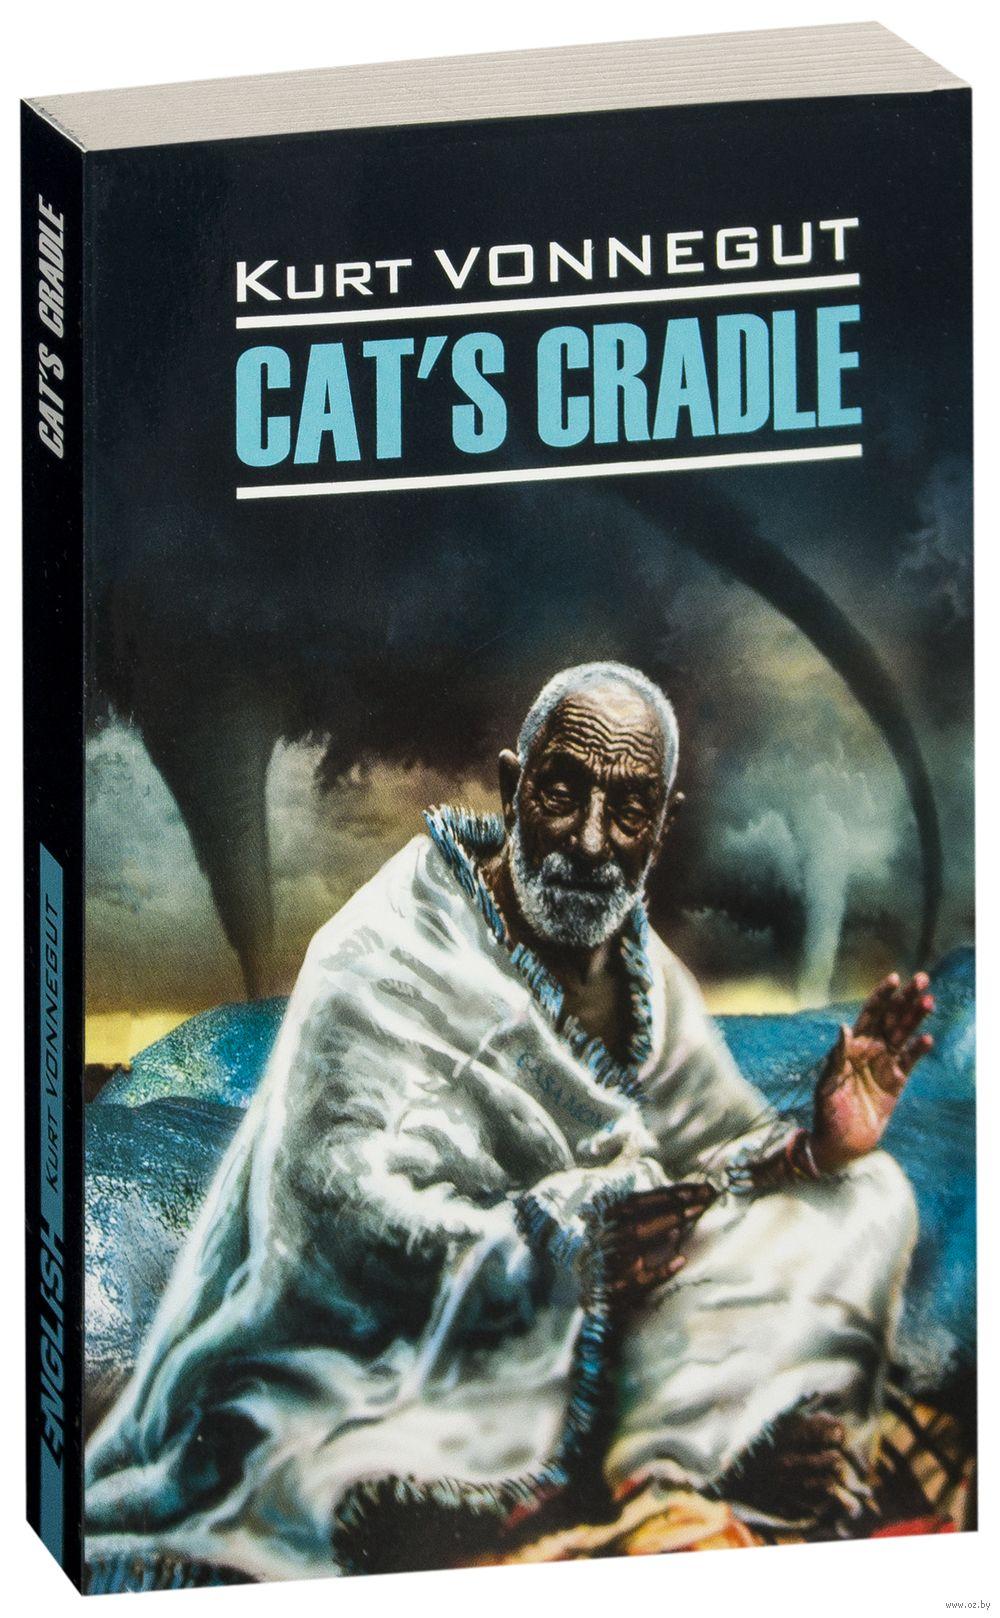 cats cradle by kurt vonnegut analysis Find great deals on ebay for cat's cradle vonnegut shop with confidence.